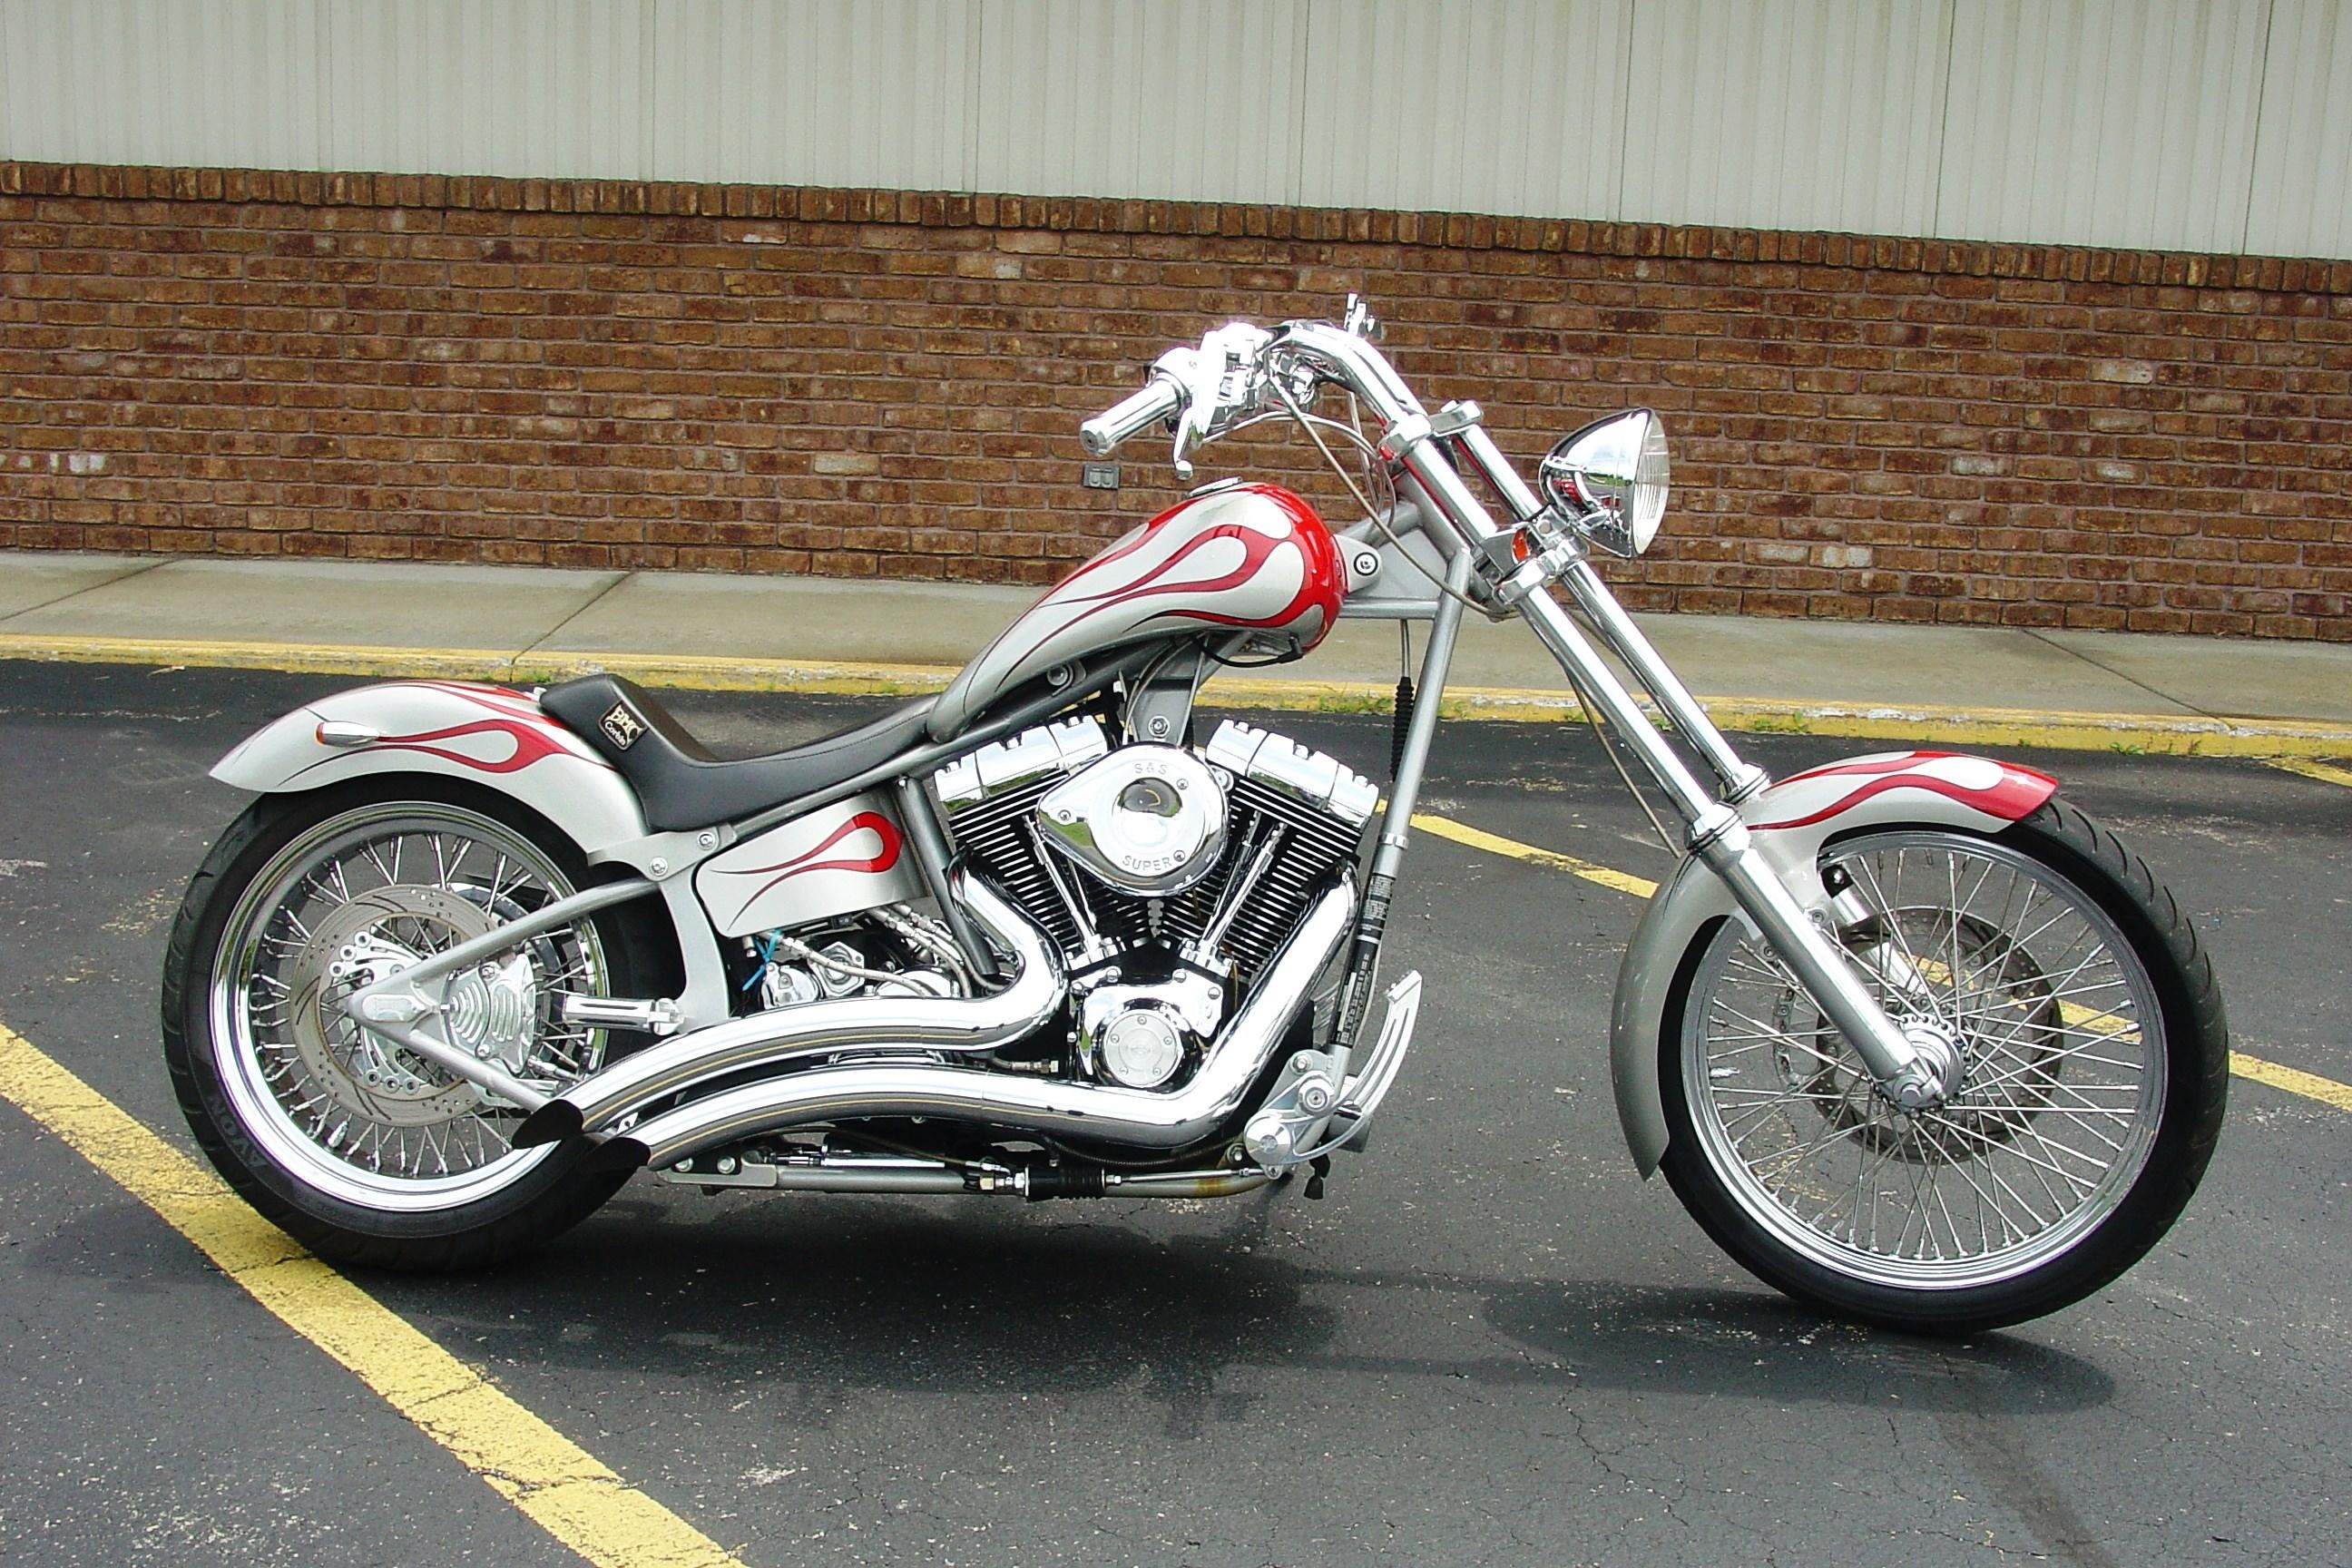 2004 BMC Choppers Notorious 988